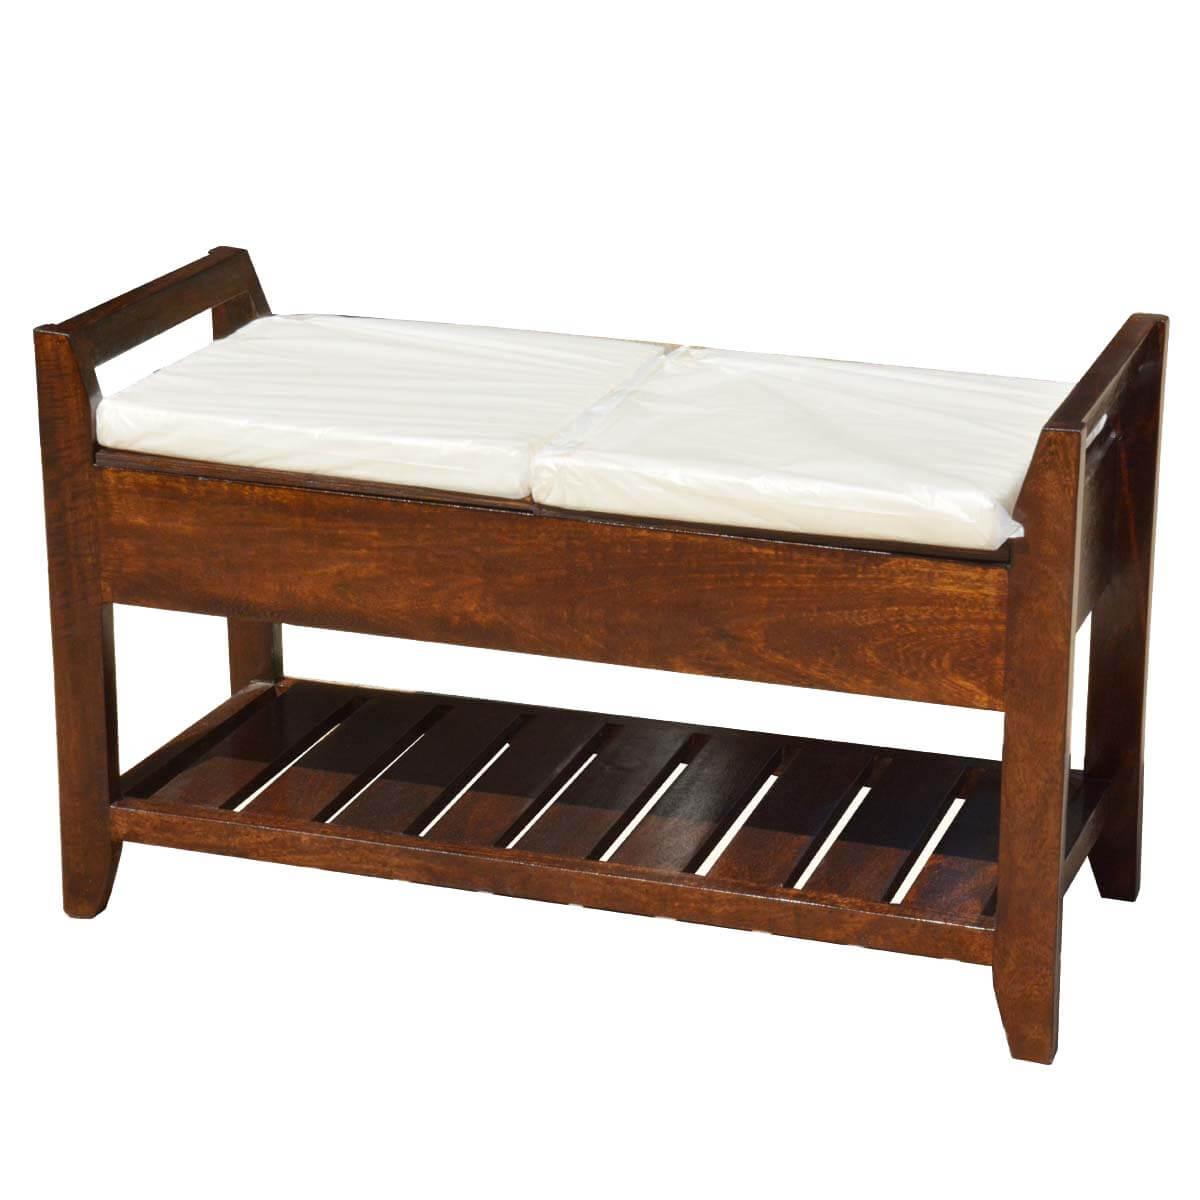 Astonishing Rustic Mission Mango Wood Cushioned Storage Bench W Bottom Rack Uwap Interior Chair Design Uwaporg